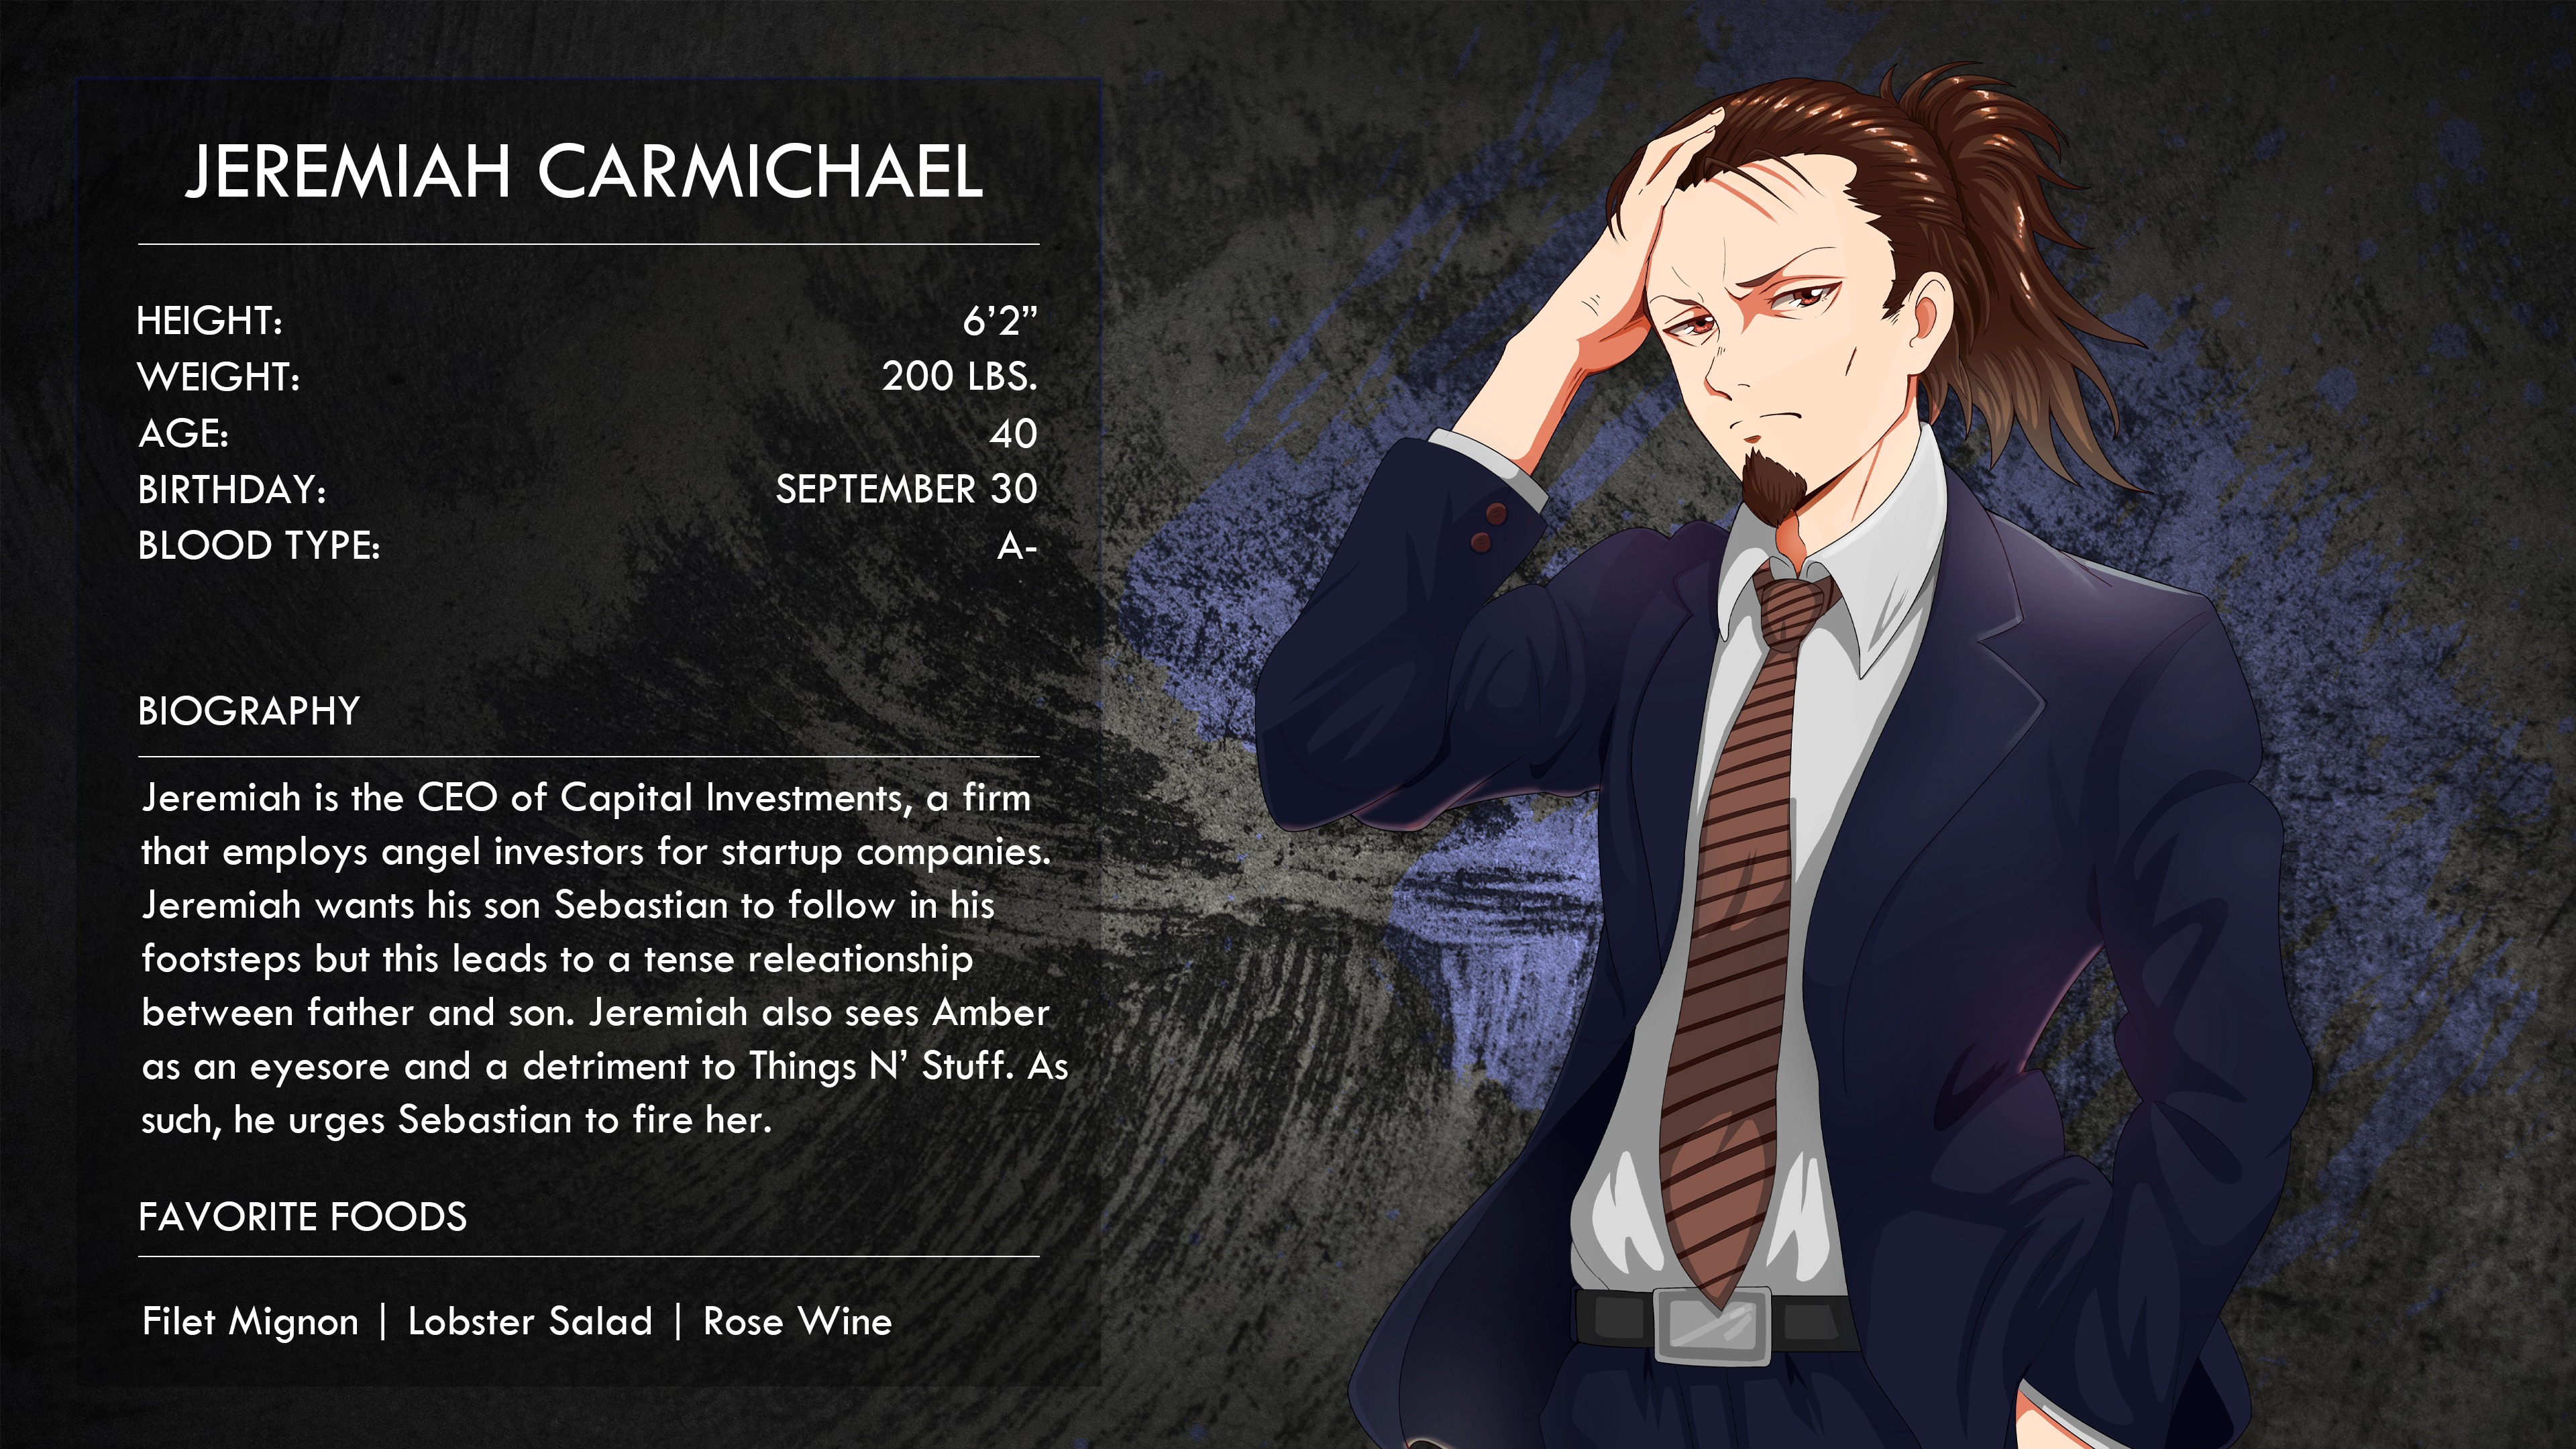 Jeremiah Carmichael